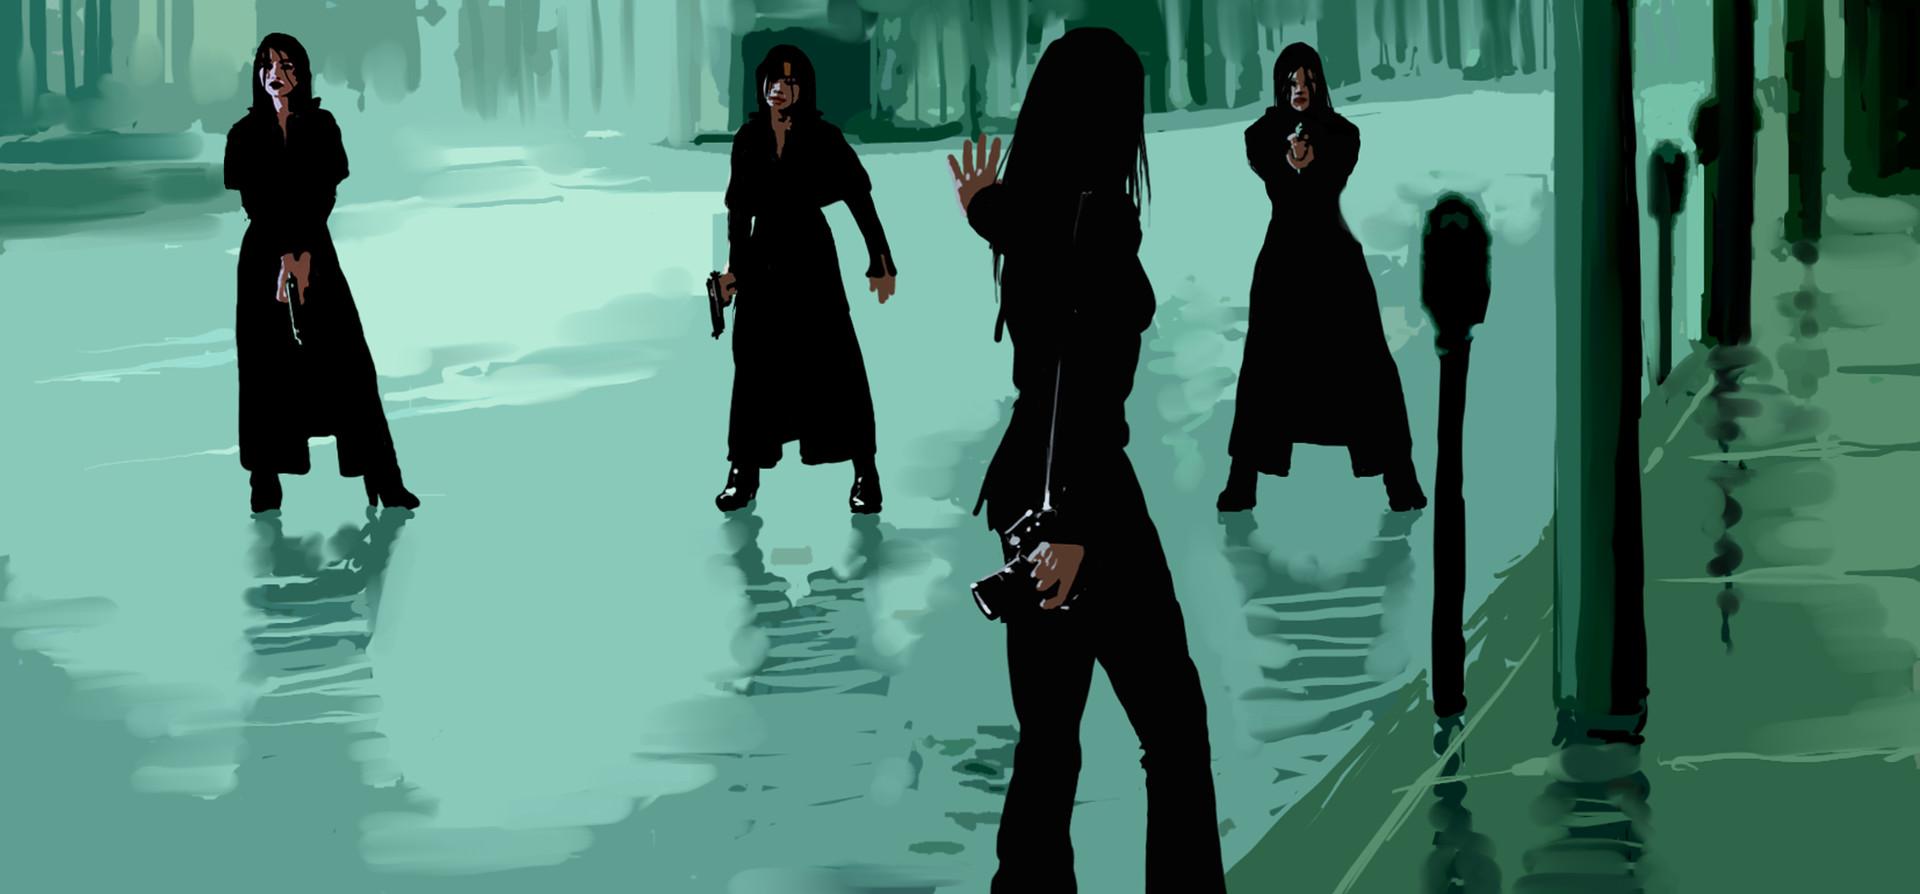 Midhat kapetanovic 13a three assassins